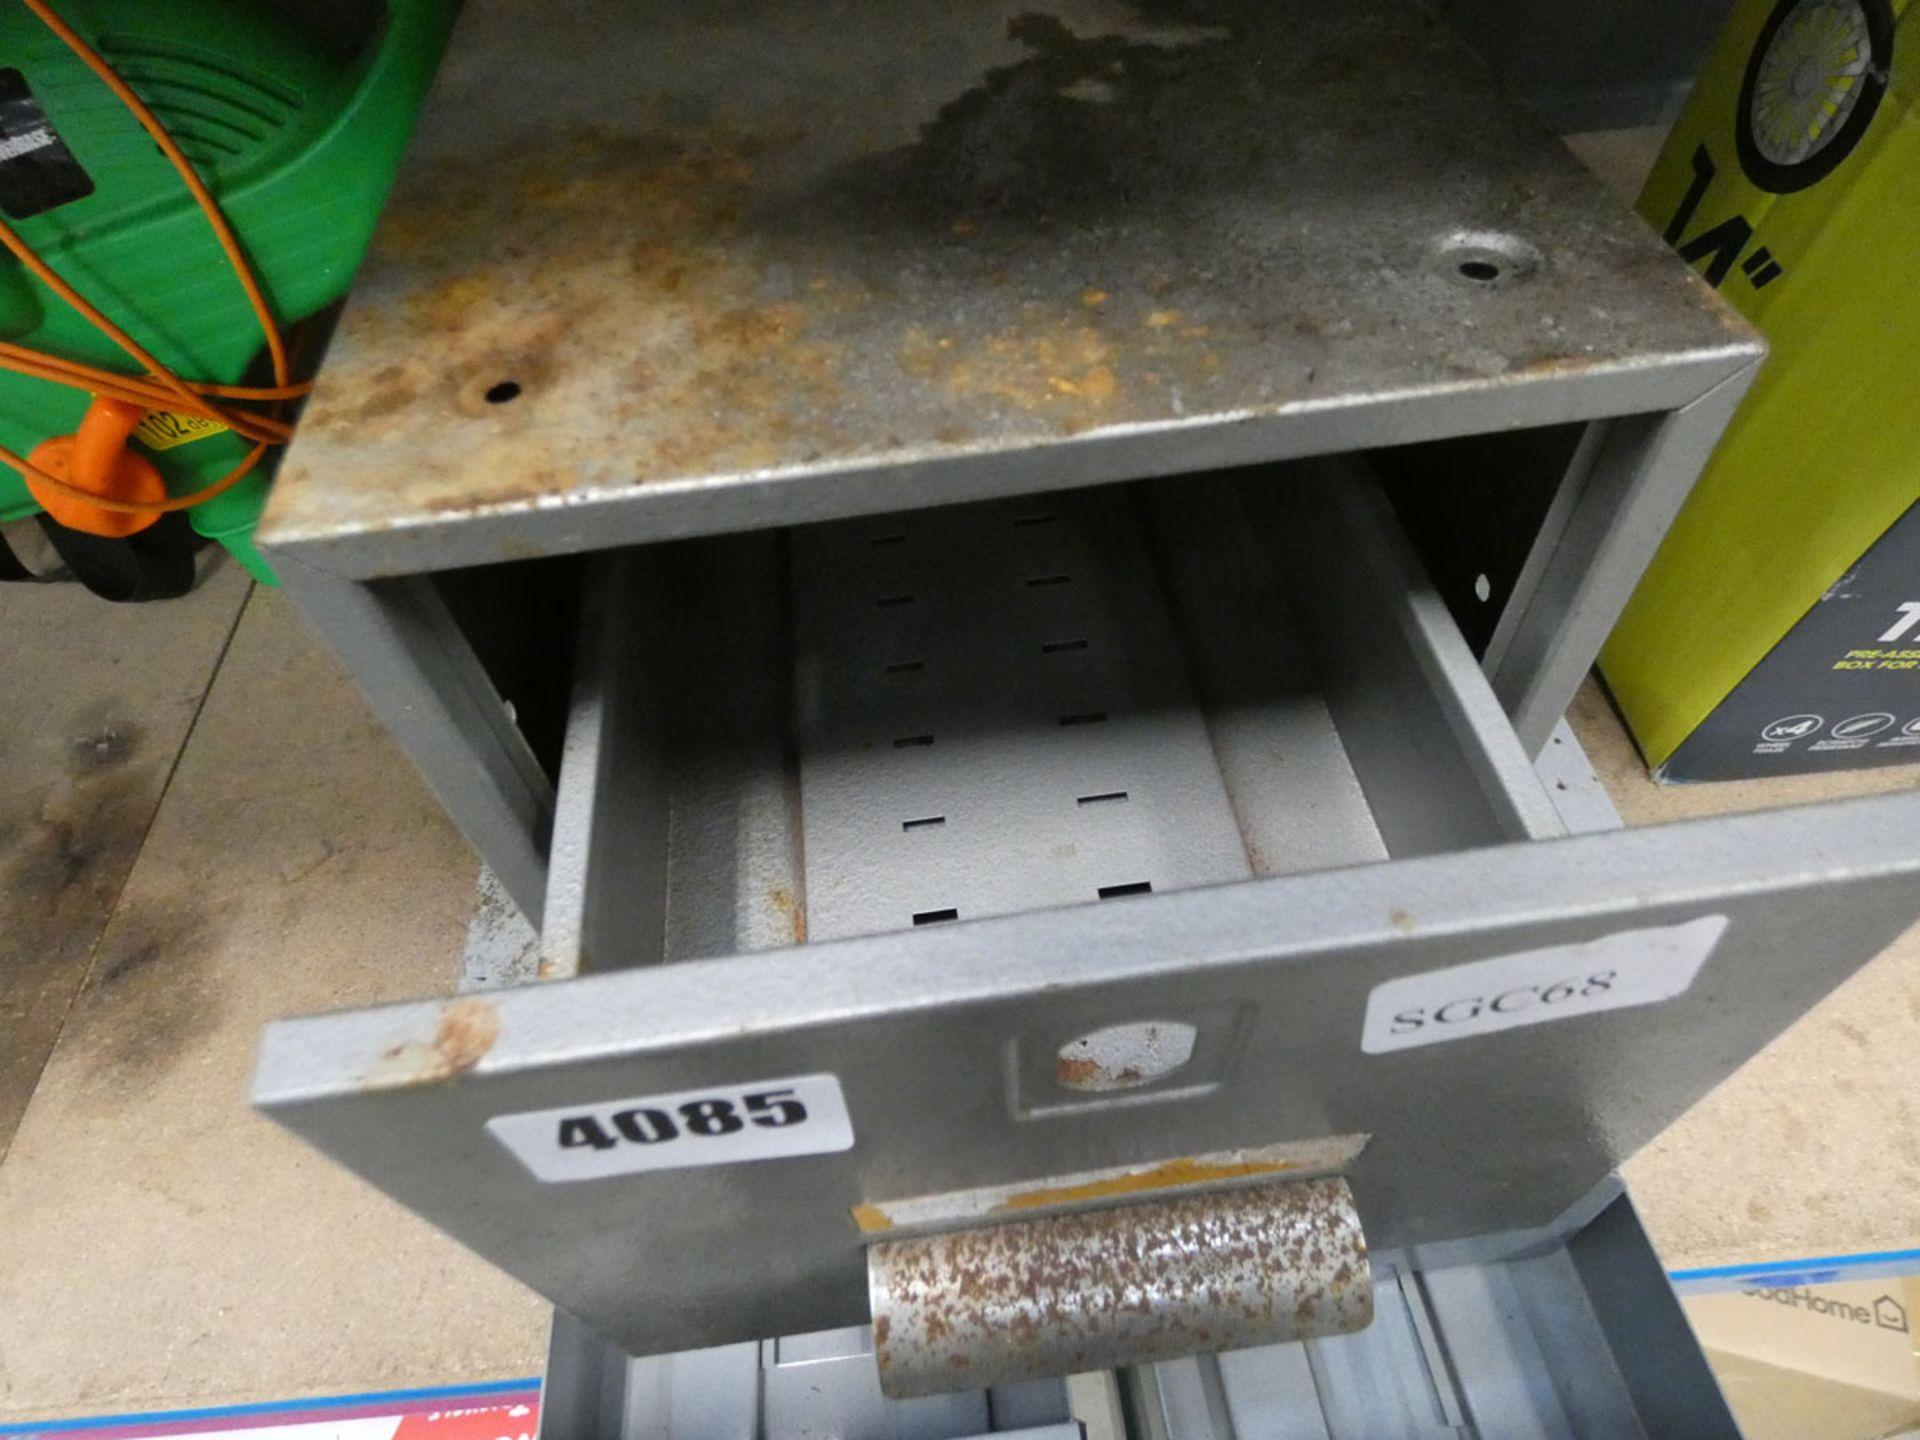 2 metal file card trays - Image 2 of 3